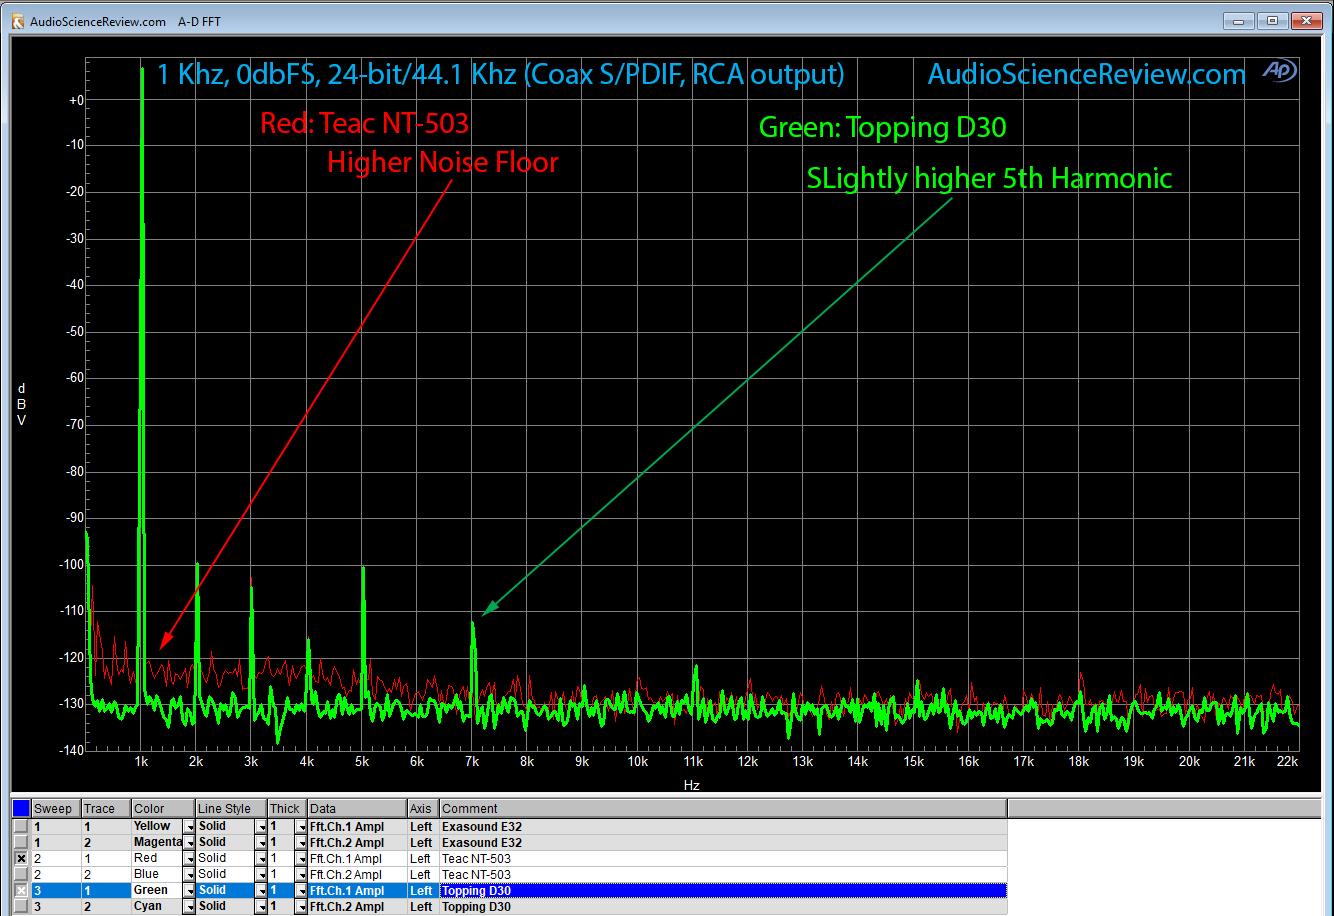 1 Khz vs Topping D30.png